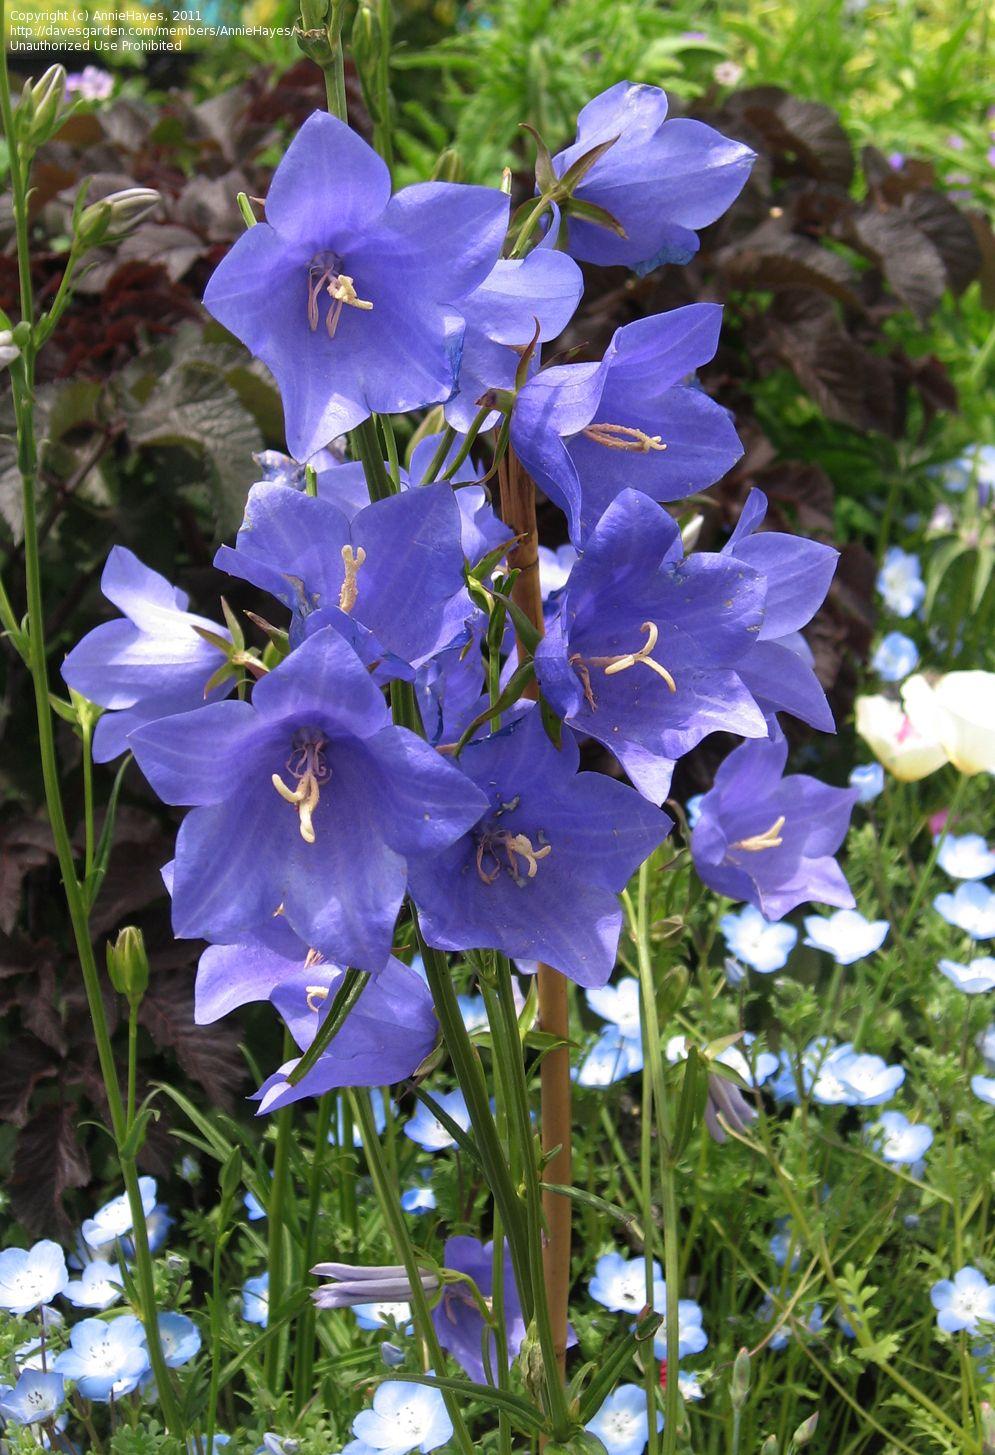 Garden Answers Plant Identification Plant Identification Free Plants Plants